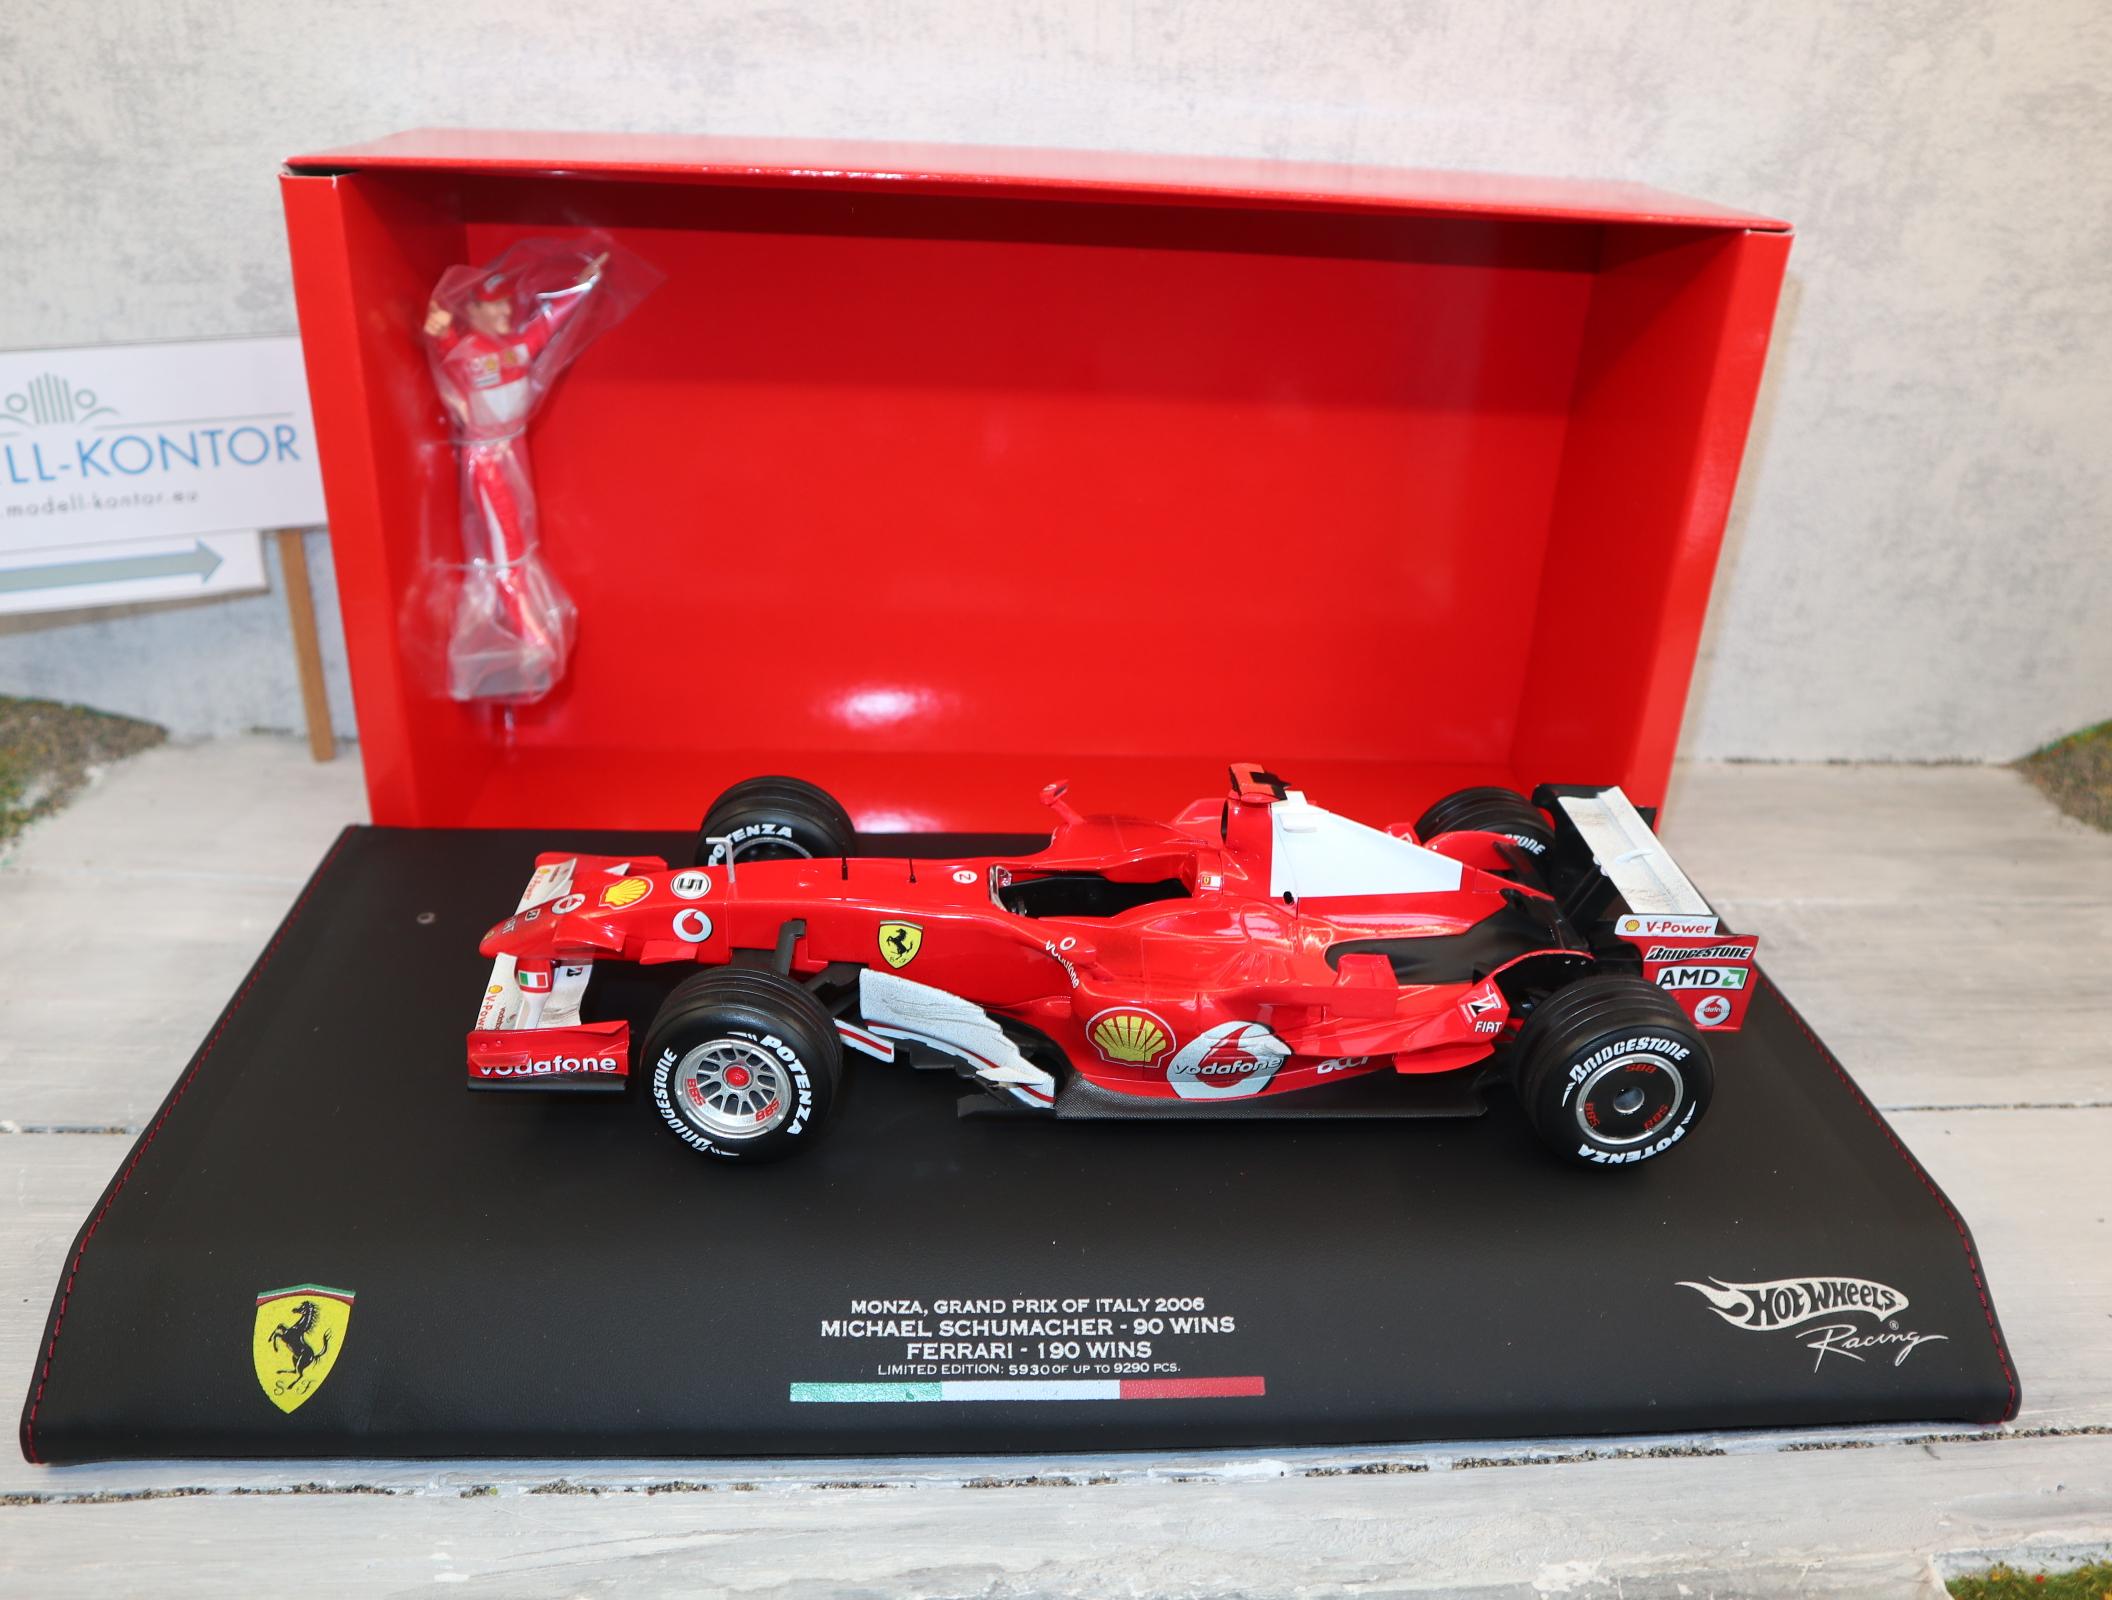 Hot Wheels J2994 1:18 Michael Schumacher Sieg in Monza 10.09.06 komplett in OVP